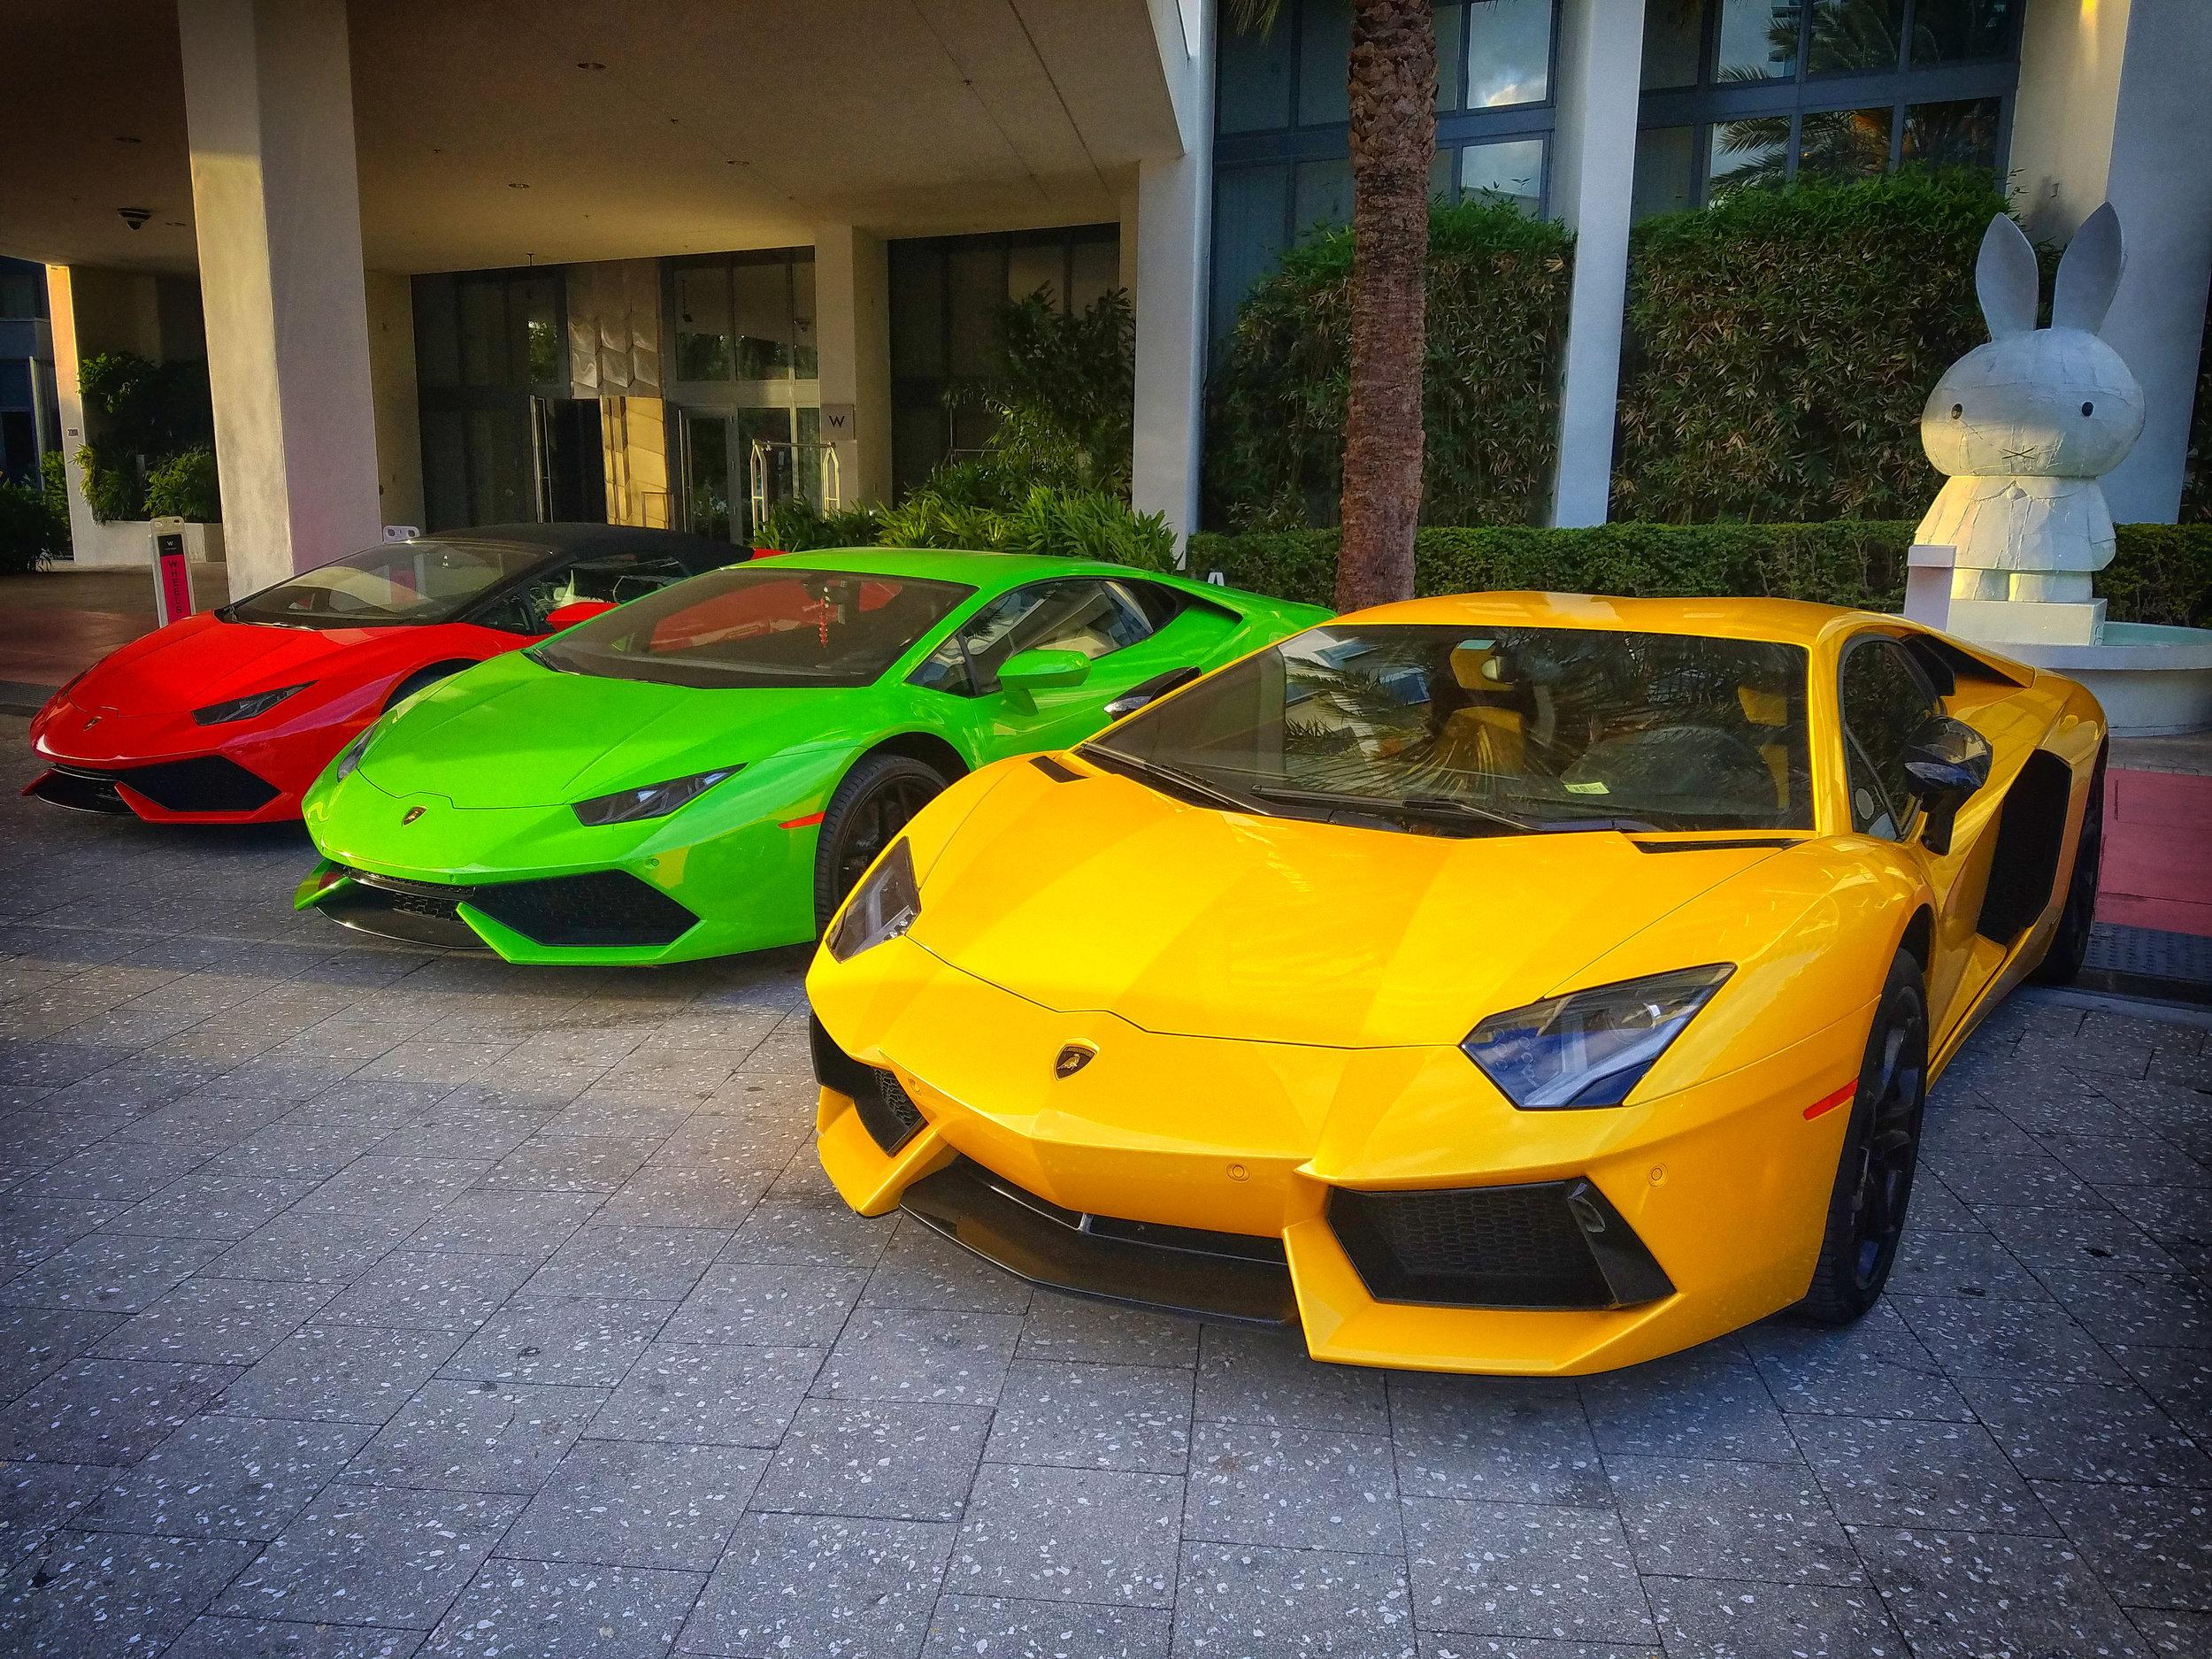 Lamborghini Huracan Drone Photography